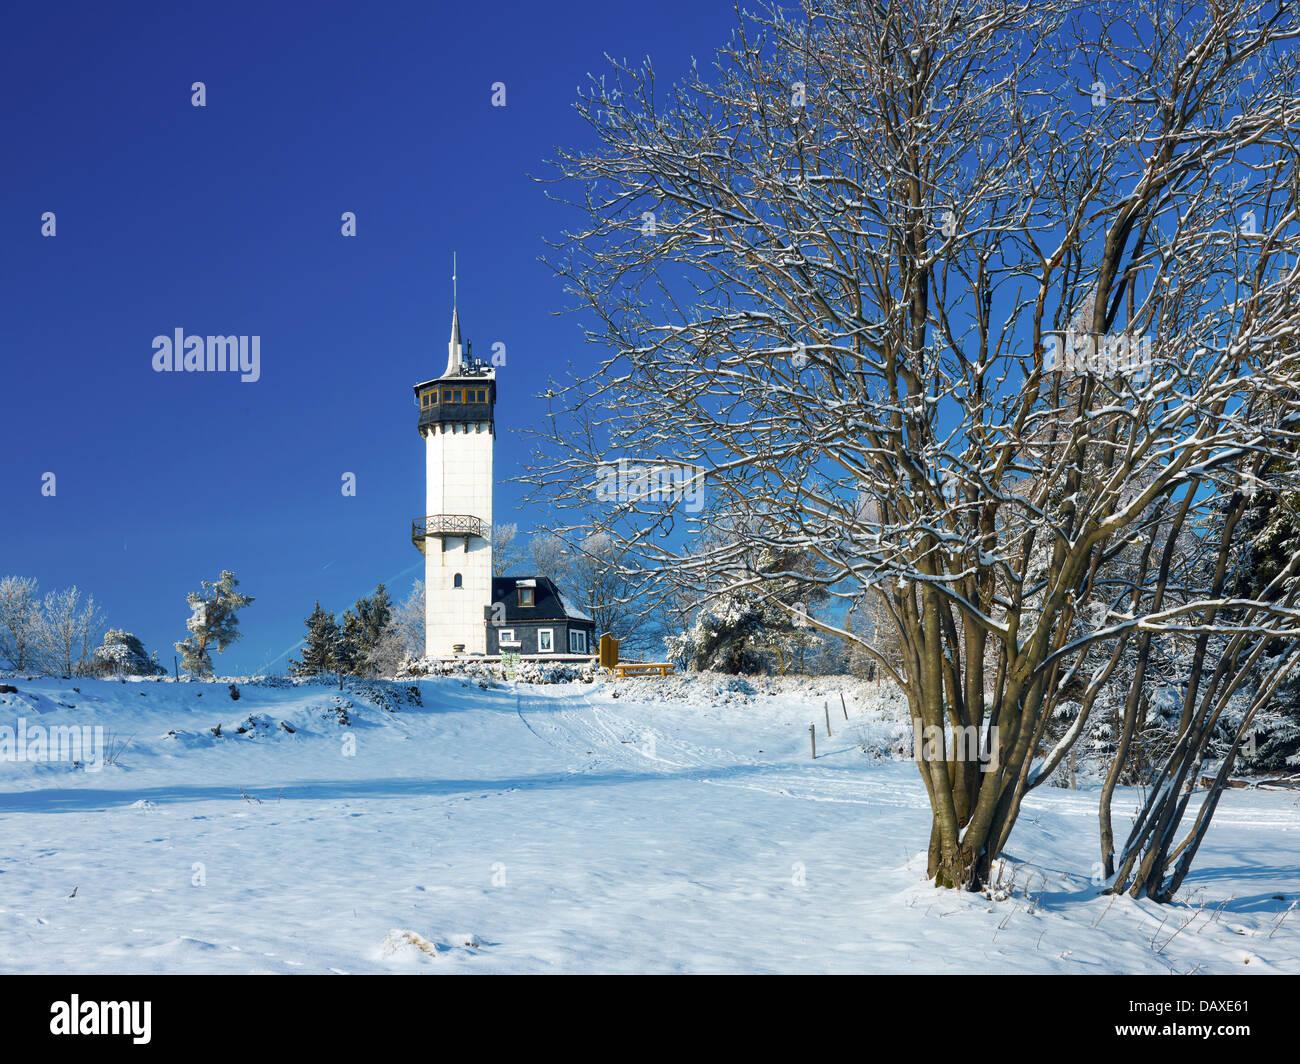 Fröbelturm, Kirchberg mountain, 784 above sea level, Oberweissbach, Thuringia, Germany - Stock Image